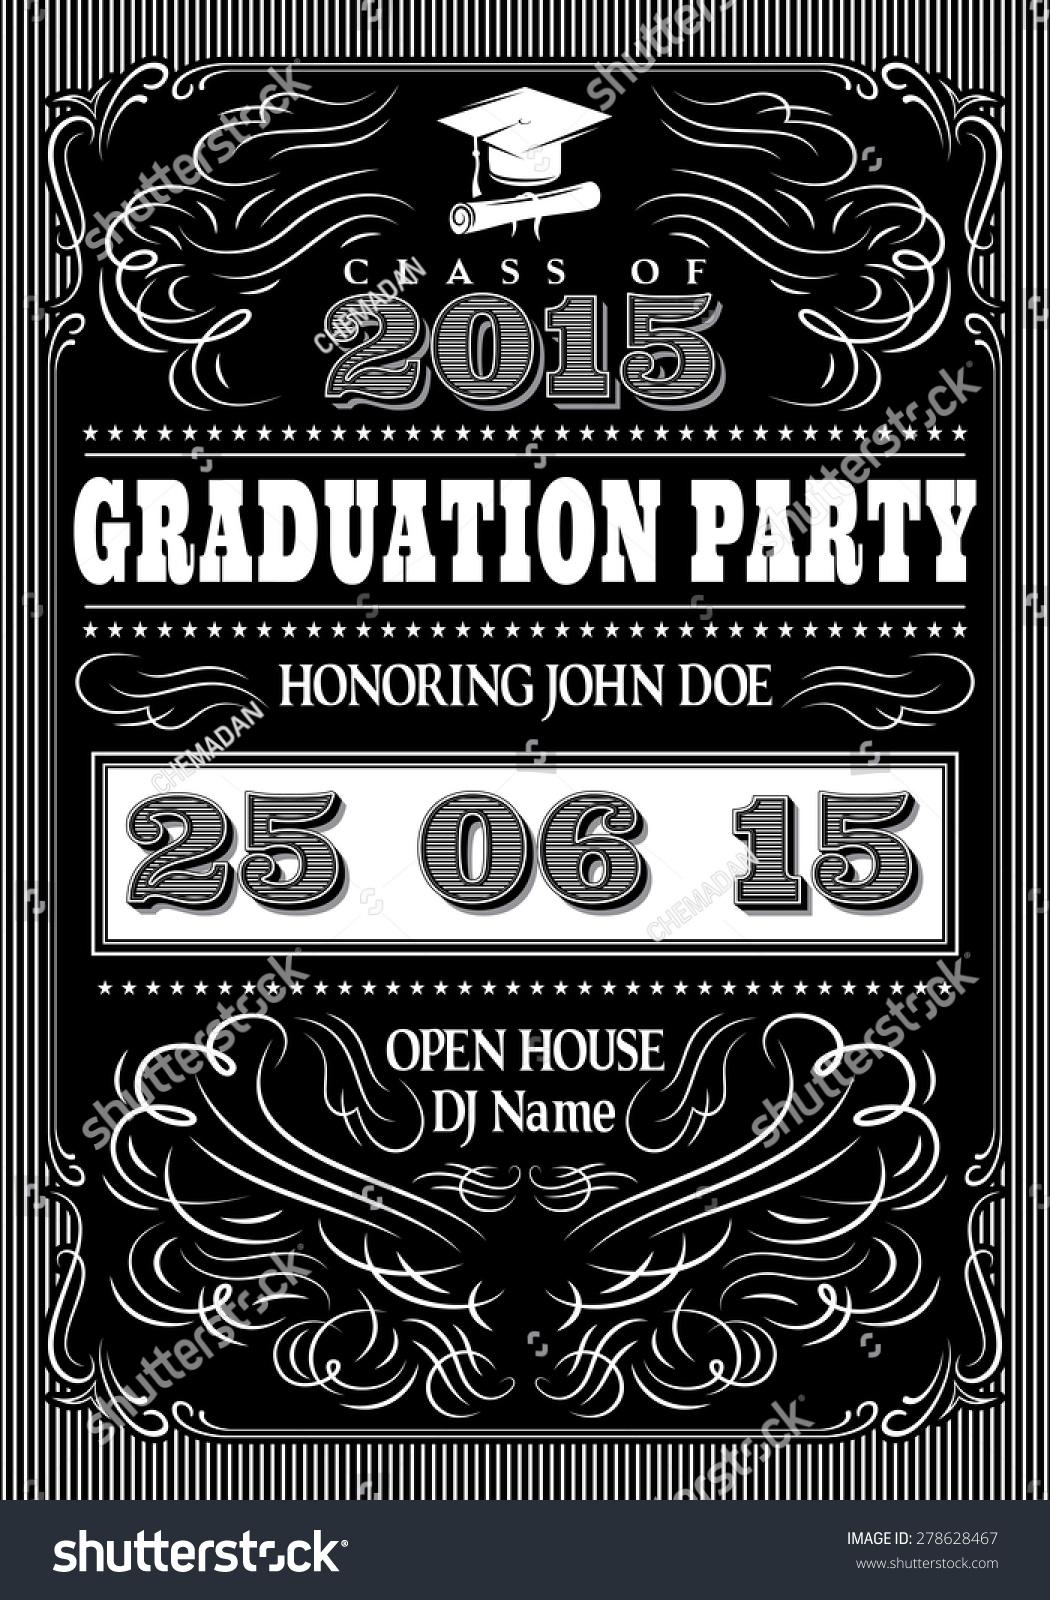 chalkboard graduation party invitation